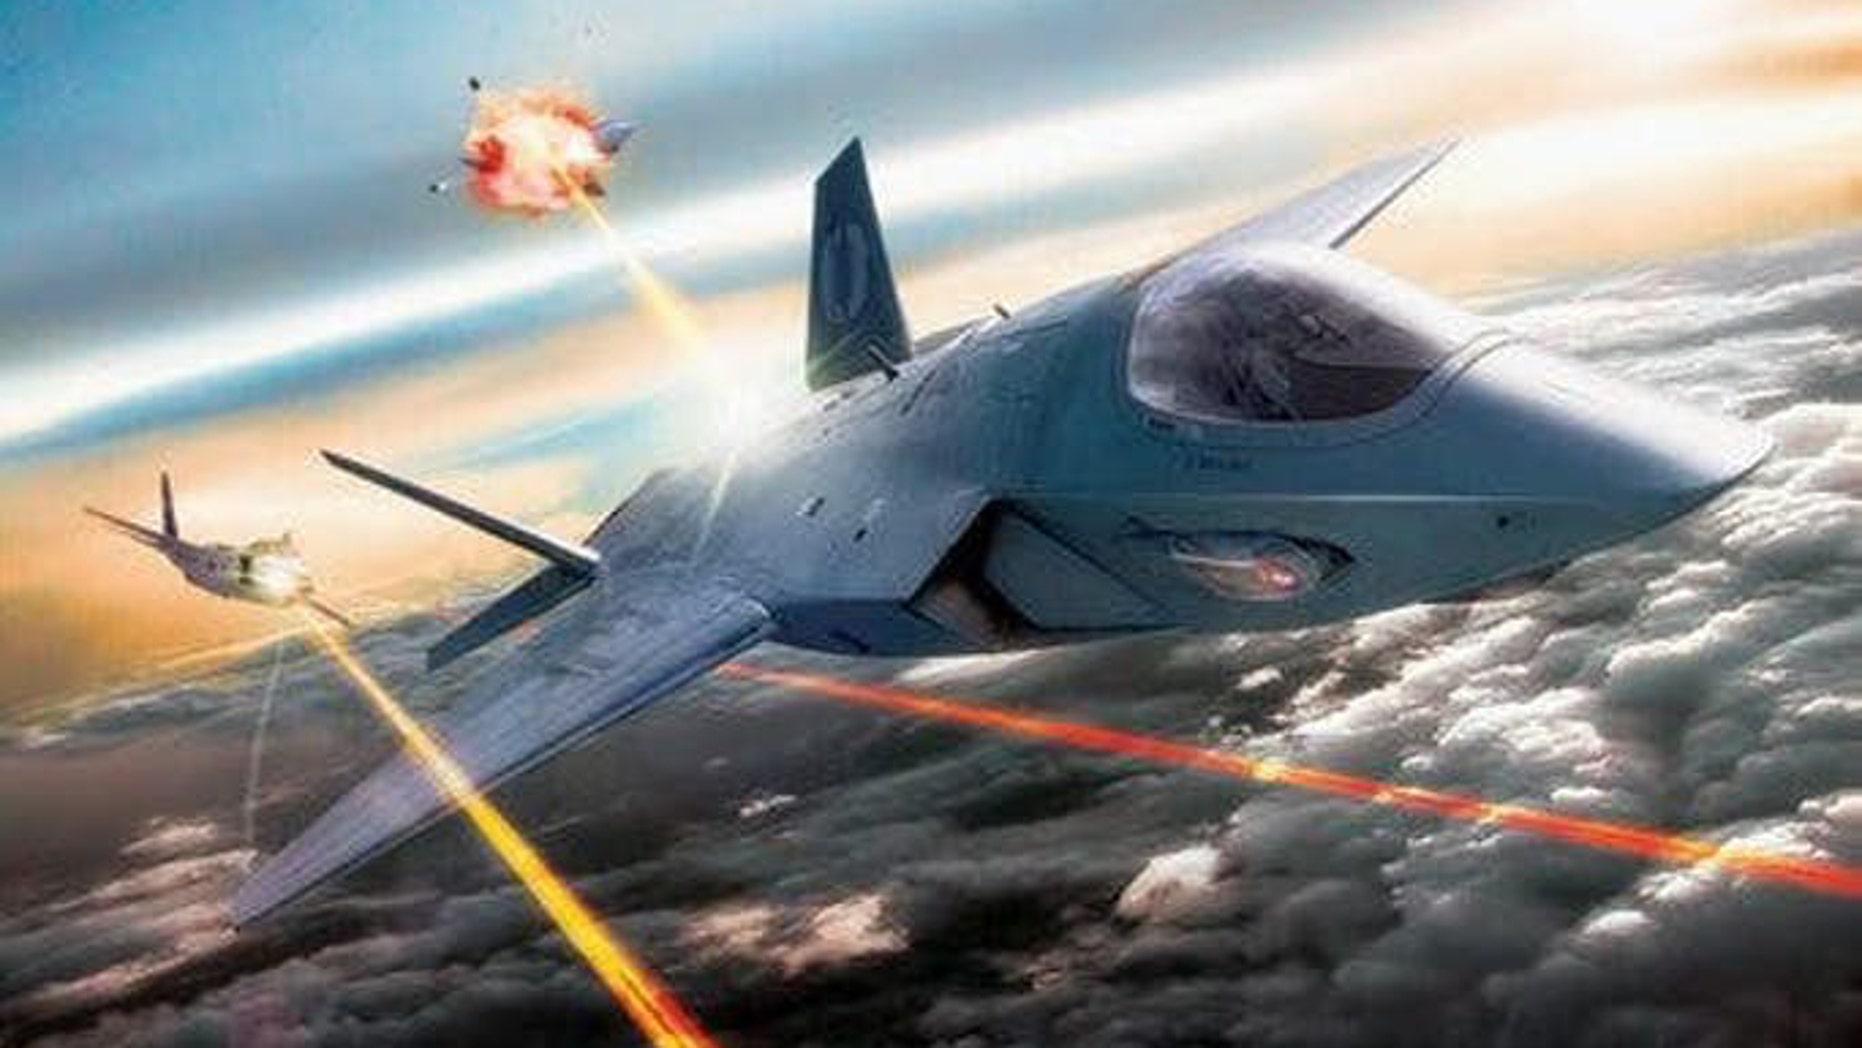 Courtesy U.S. Air Force